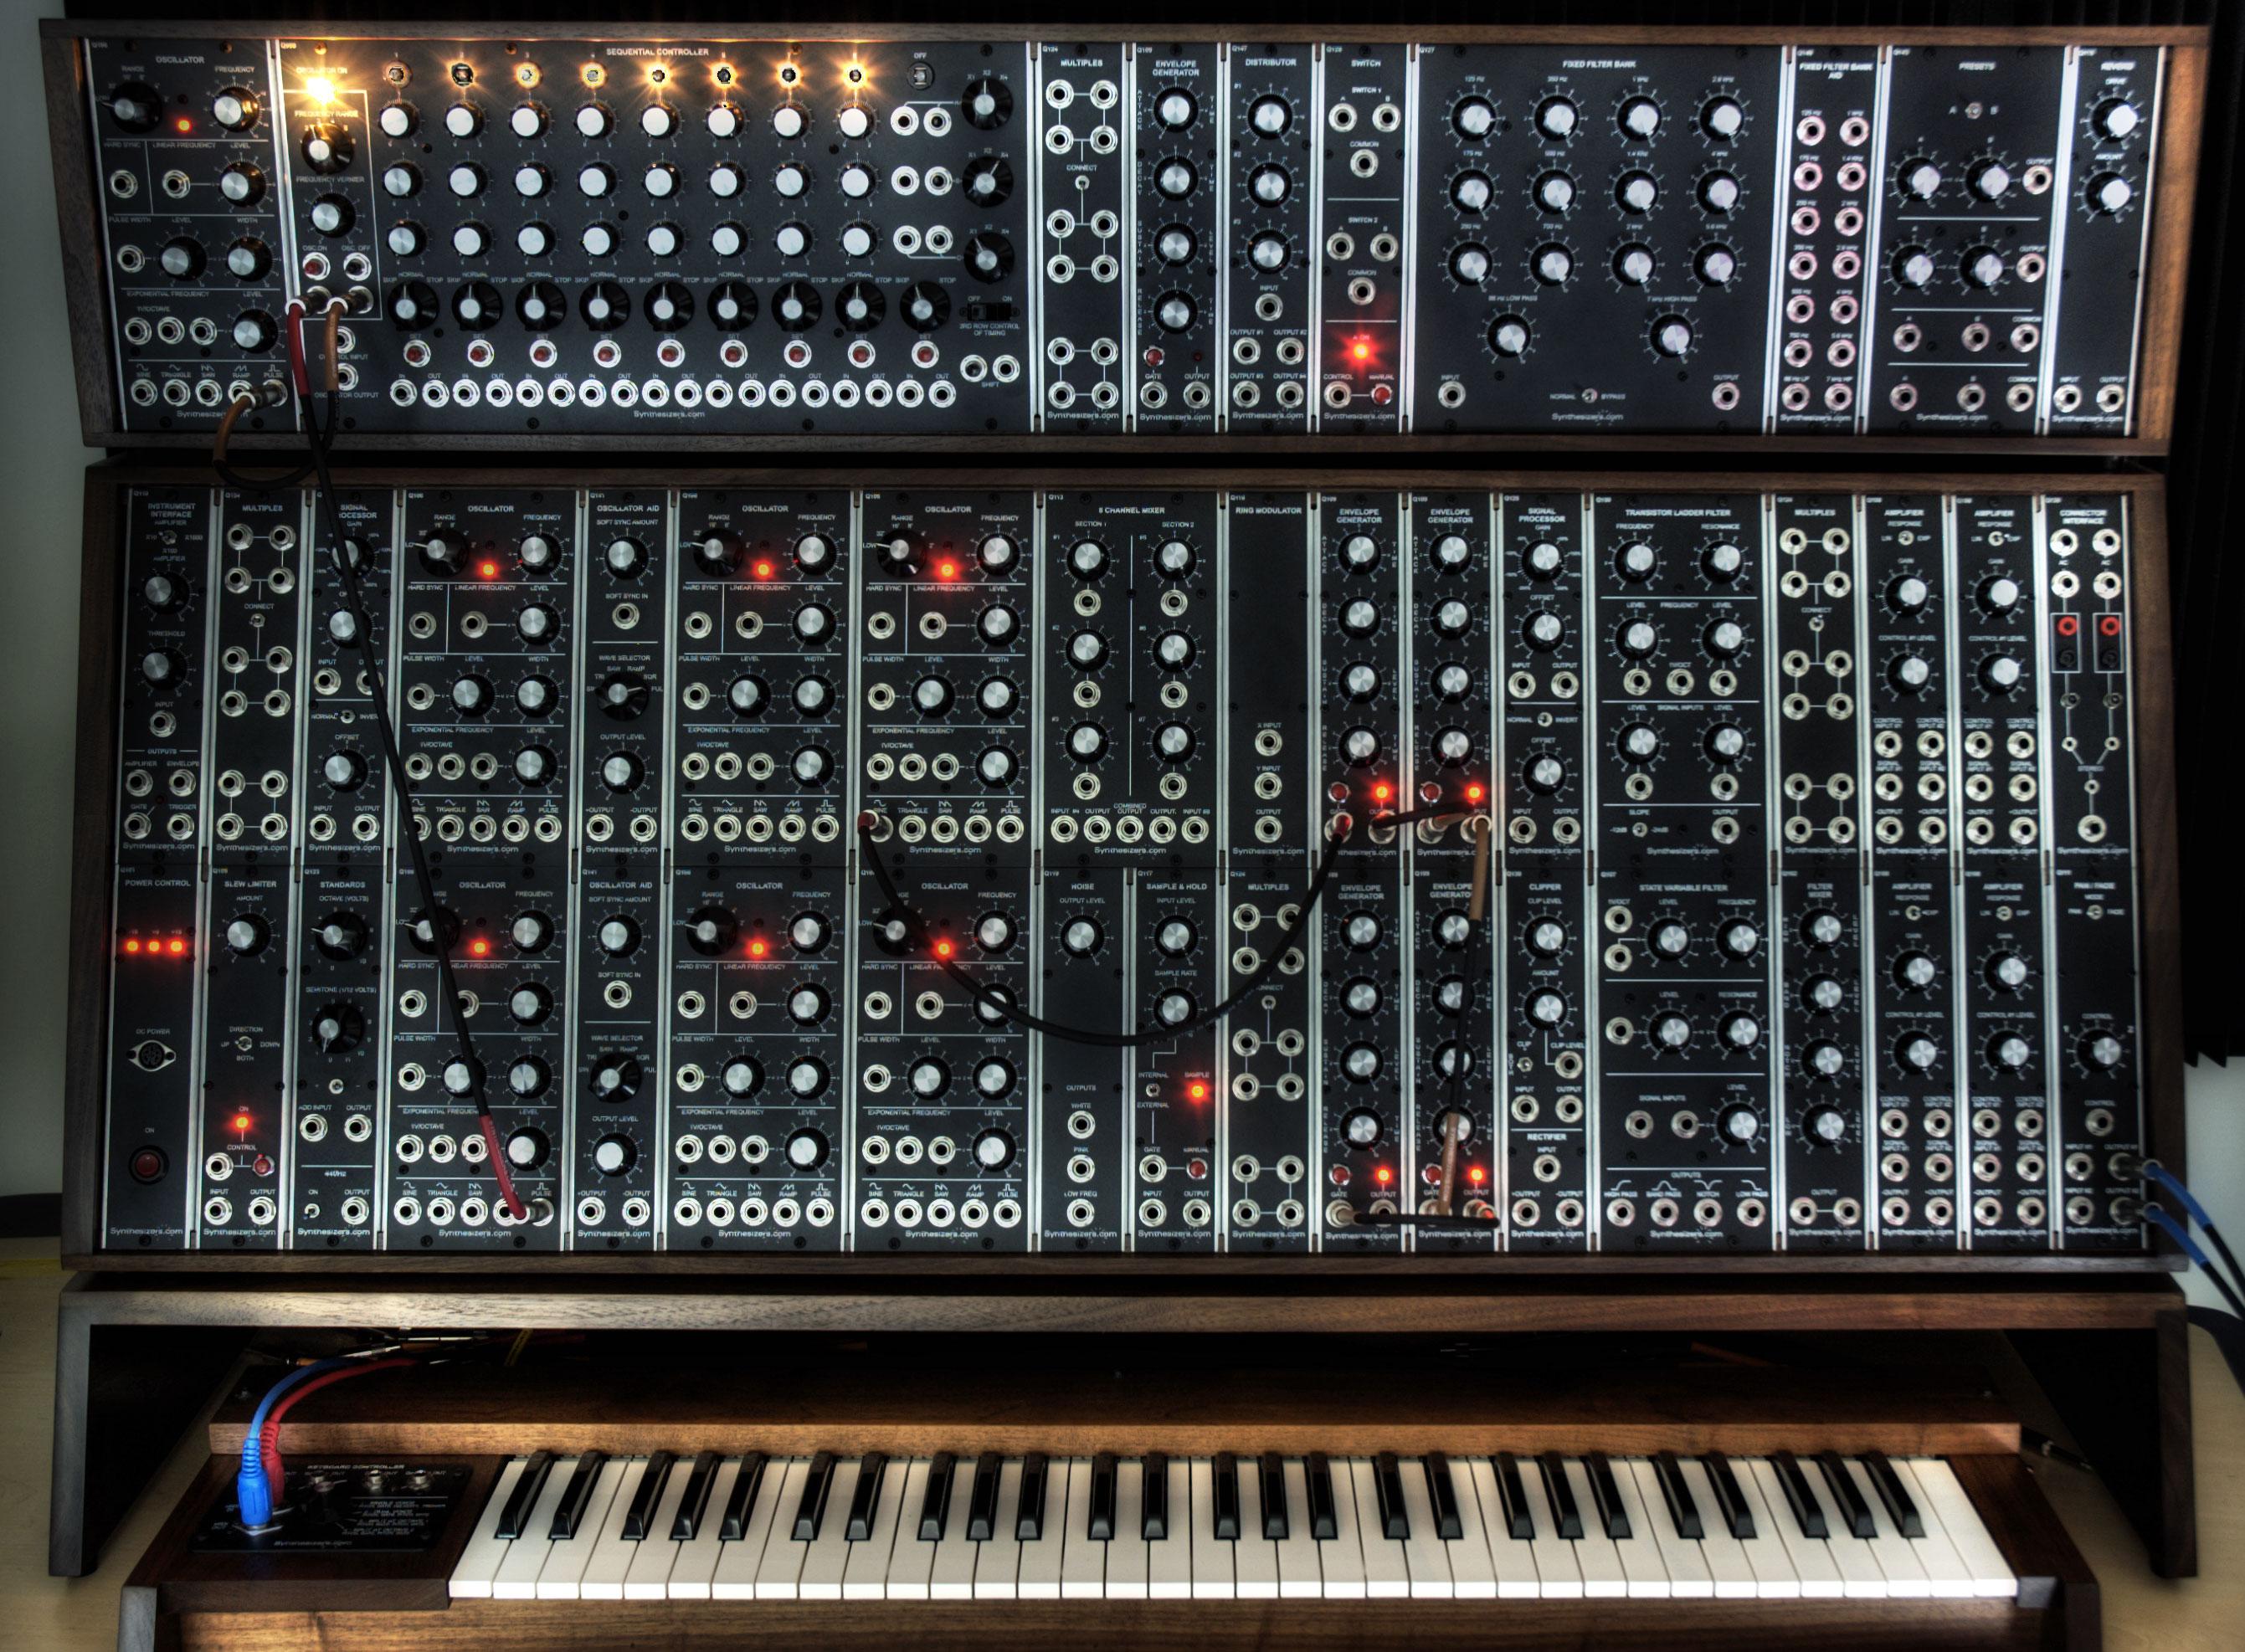 moog modular hd extraordinary - photo #9